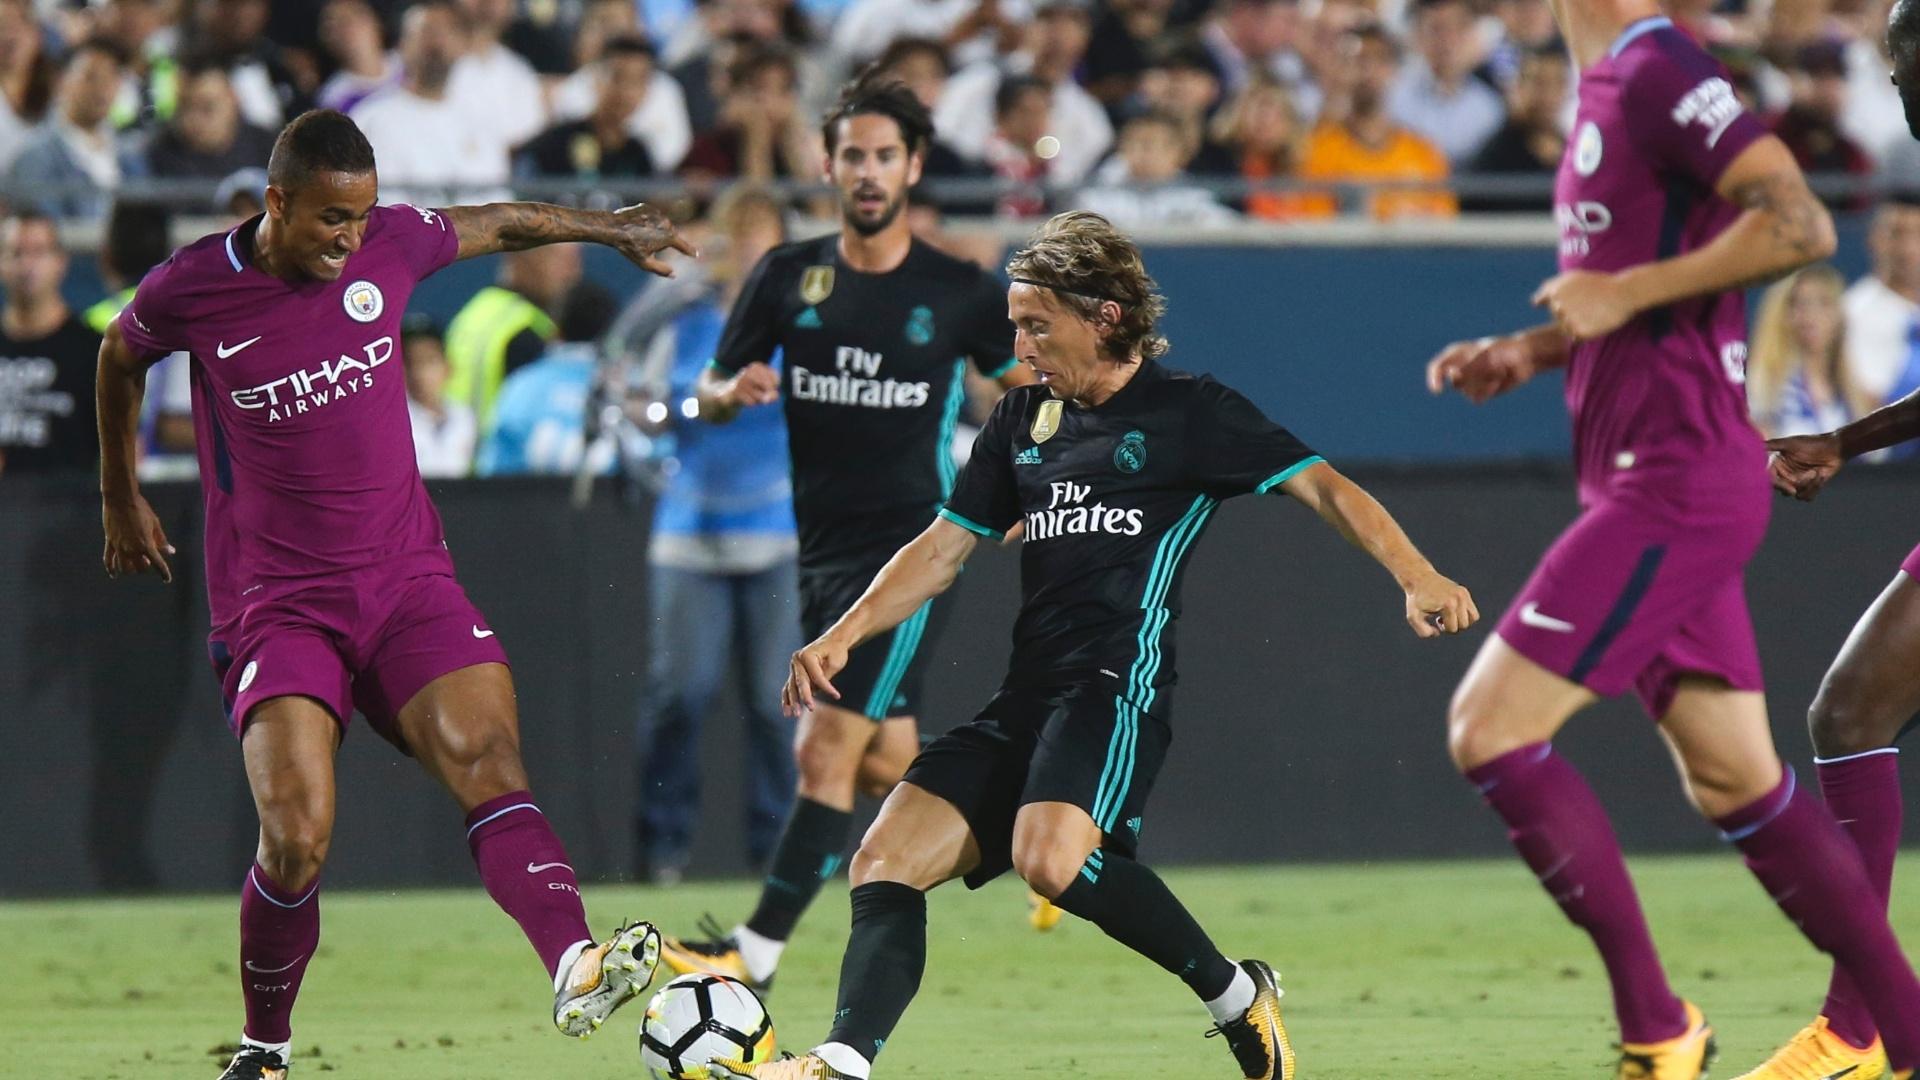 Danilo e Modric disputam lance em amistoso Manchester City x Real Madrid